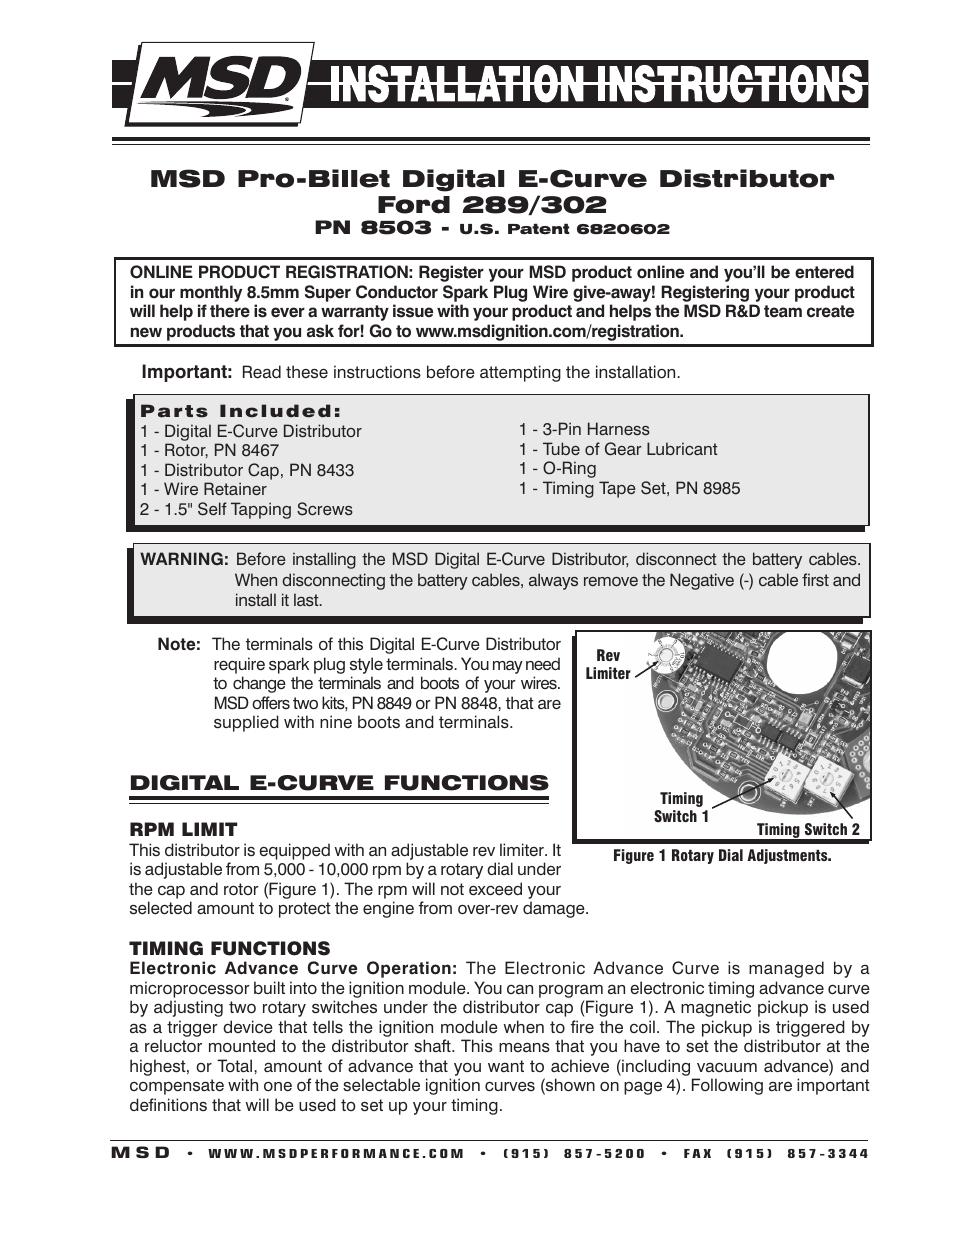 MSD 8503 Ford 289, 302 E-Curve Pro-Billet Distributor Installation